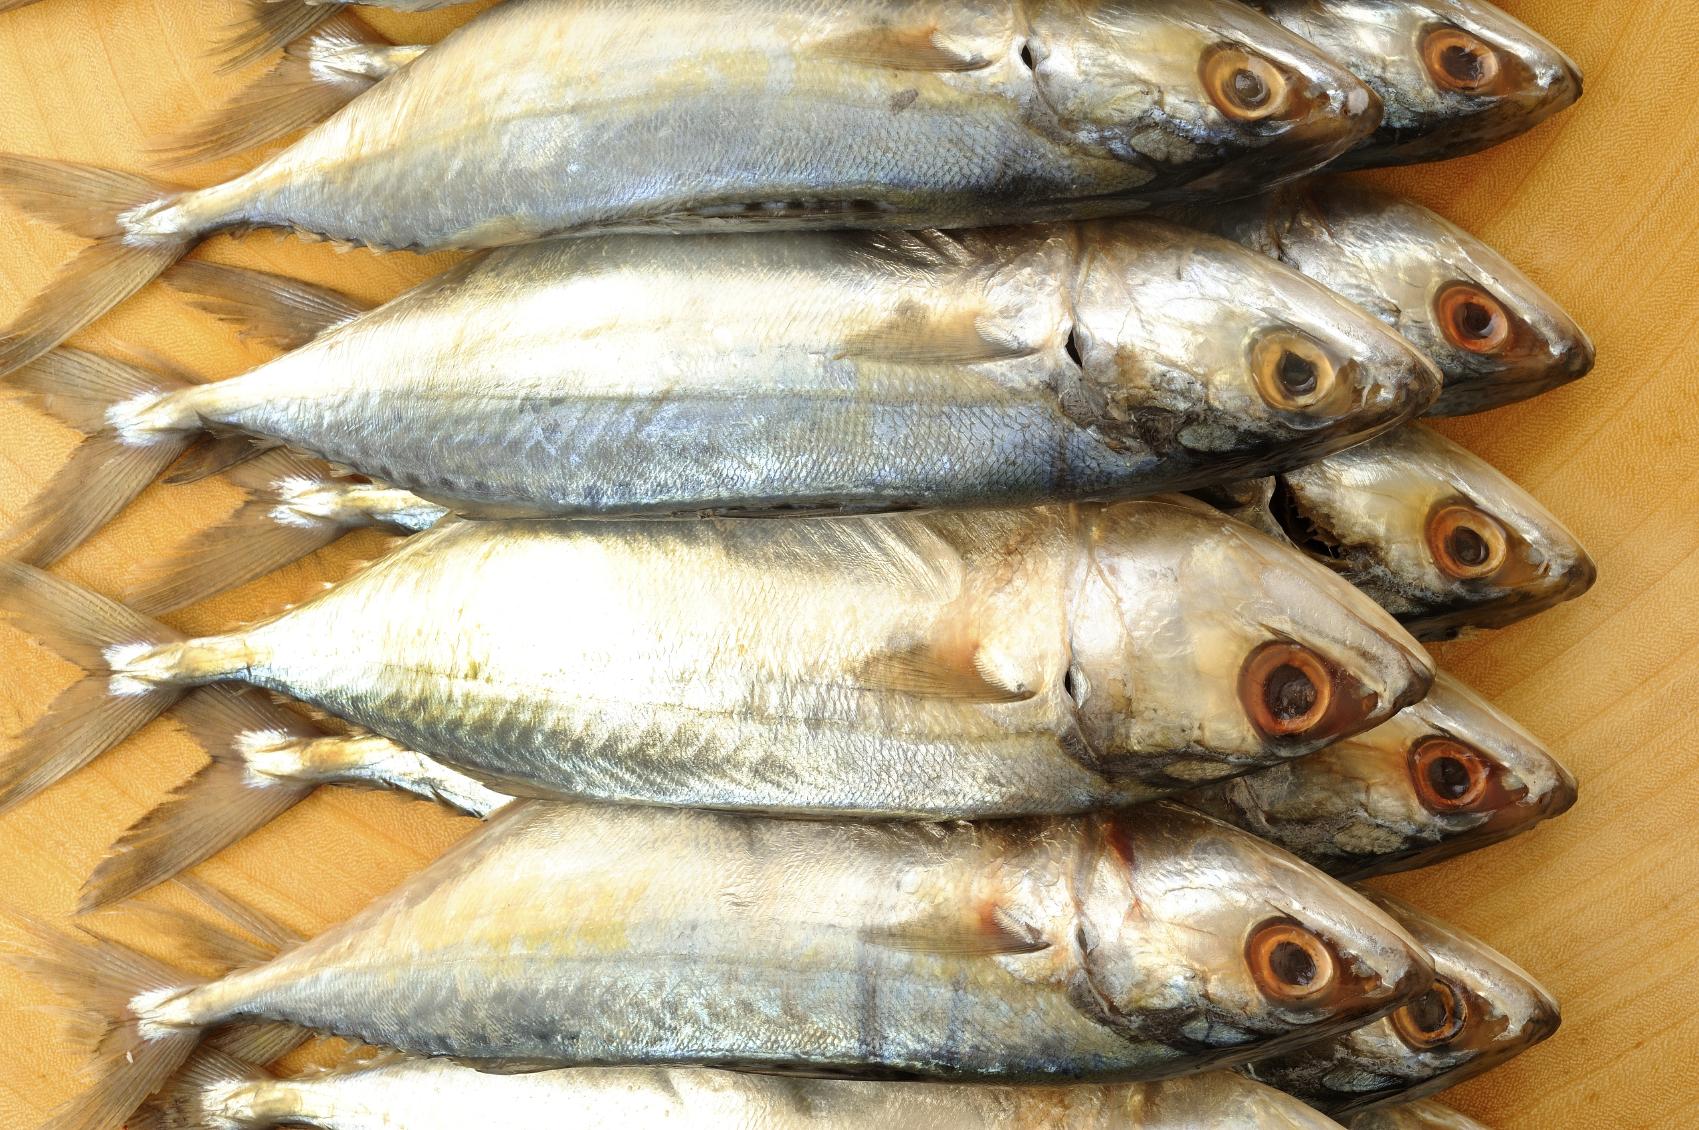 Pesce d 39 aprile quali specie comprare for Comprare pesci